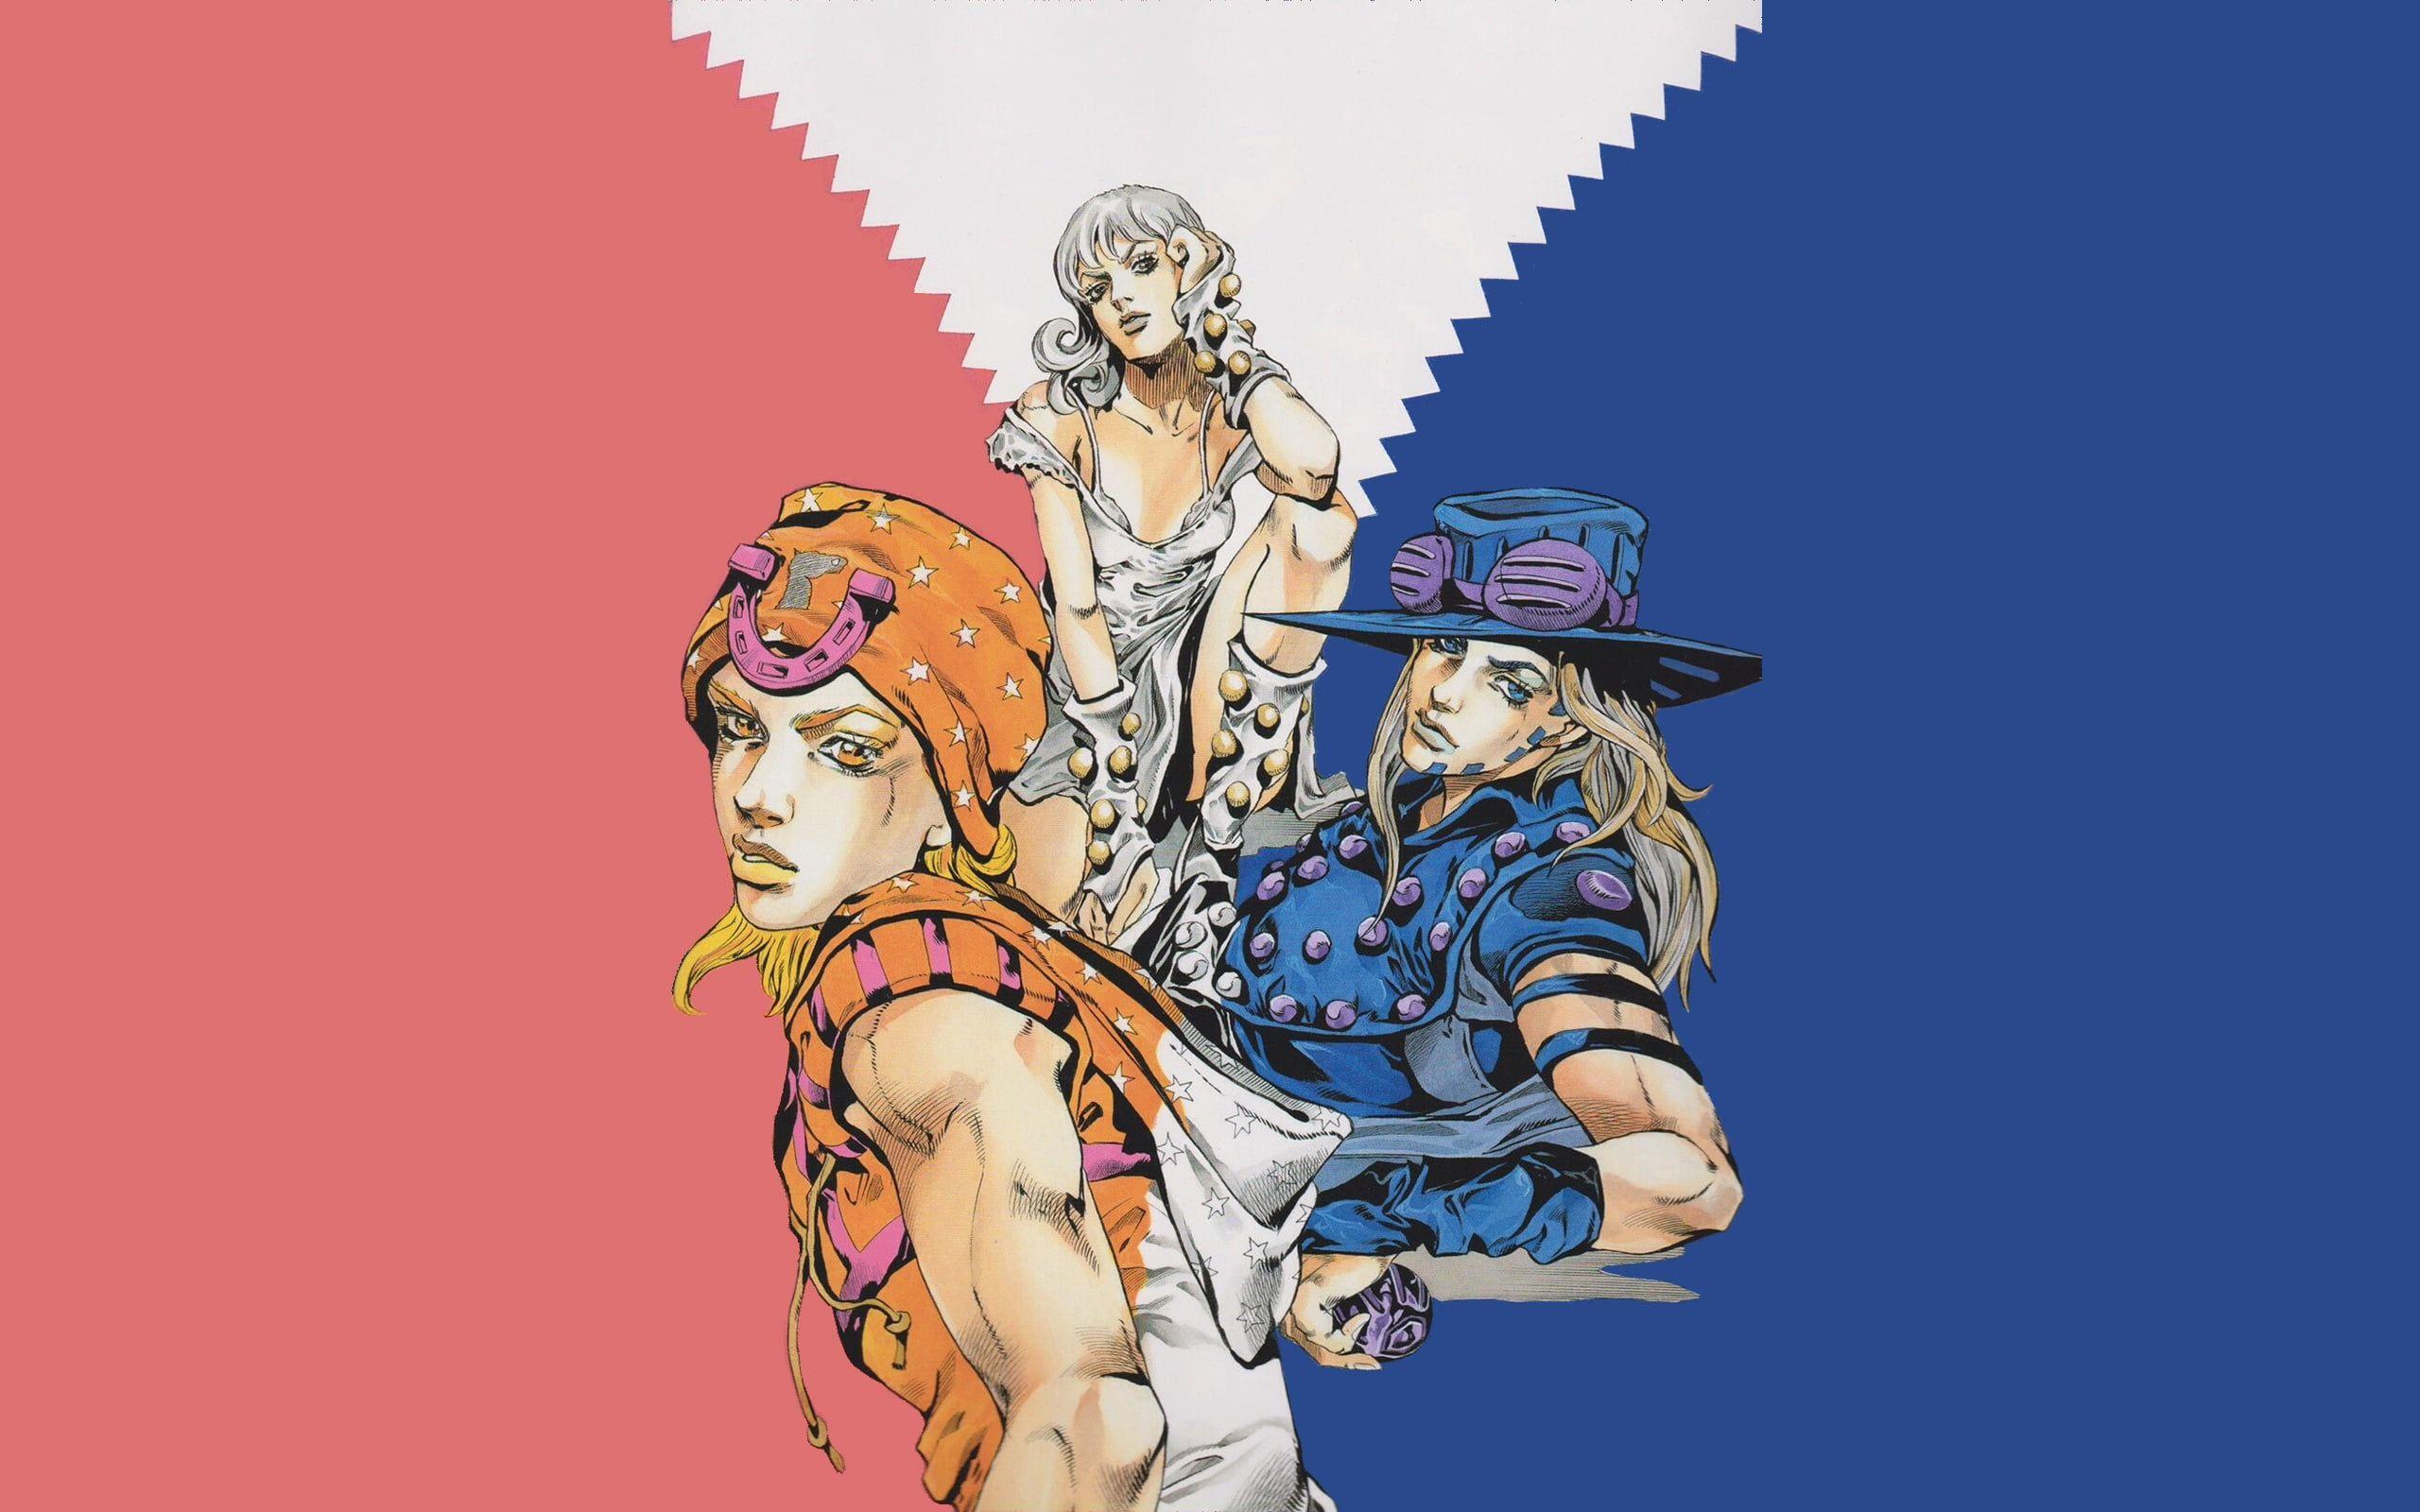 Jojo S Bizarre Adventure Jojolion Anime Manga Hirohiko Araki